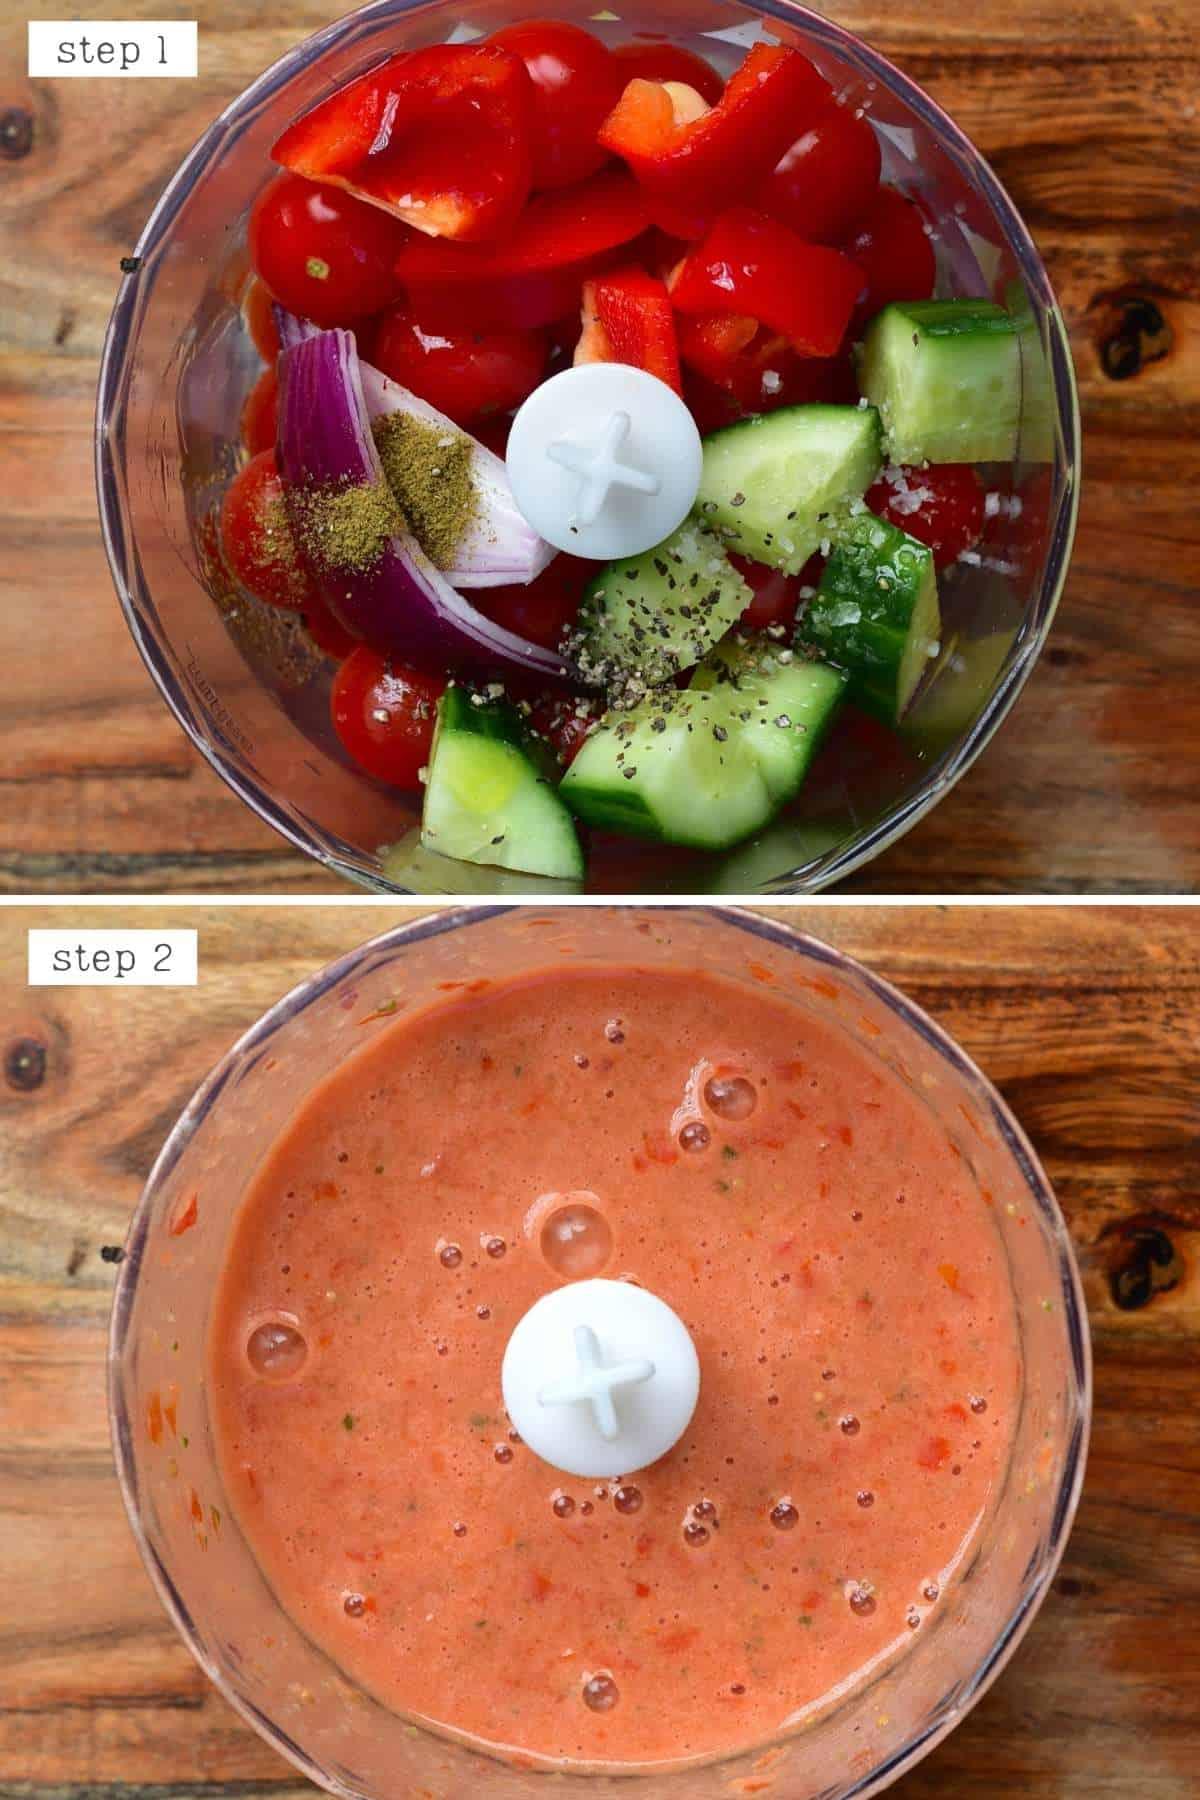 Steps for making gazpacho